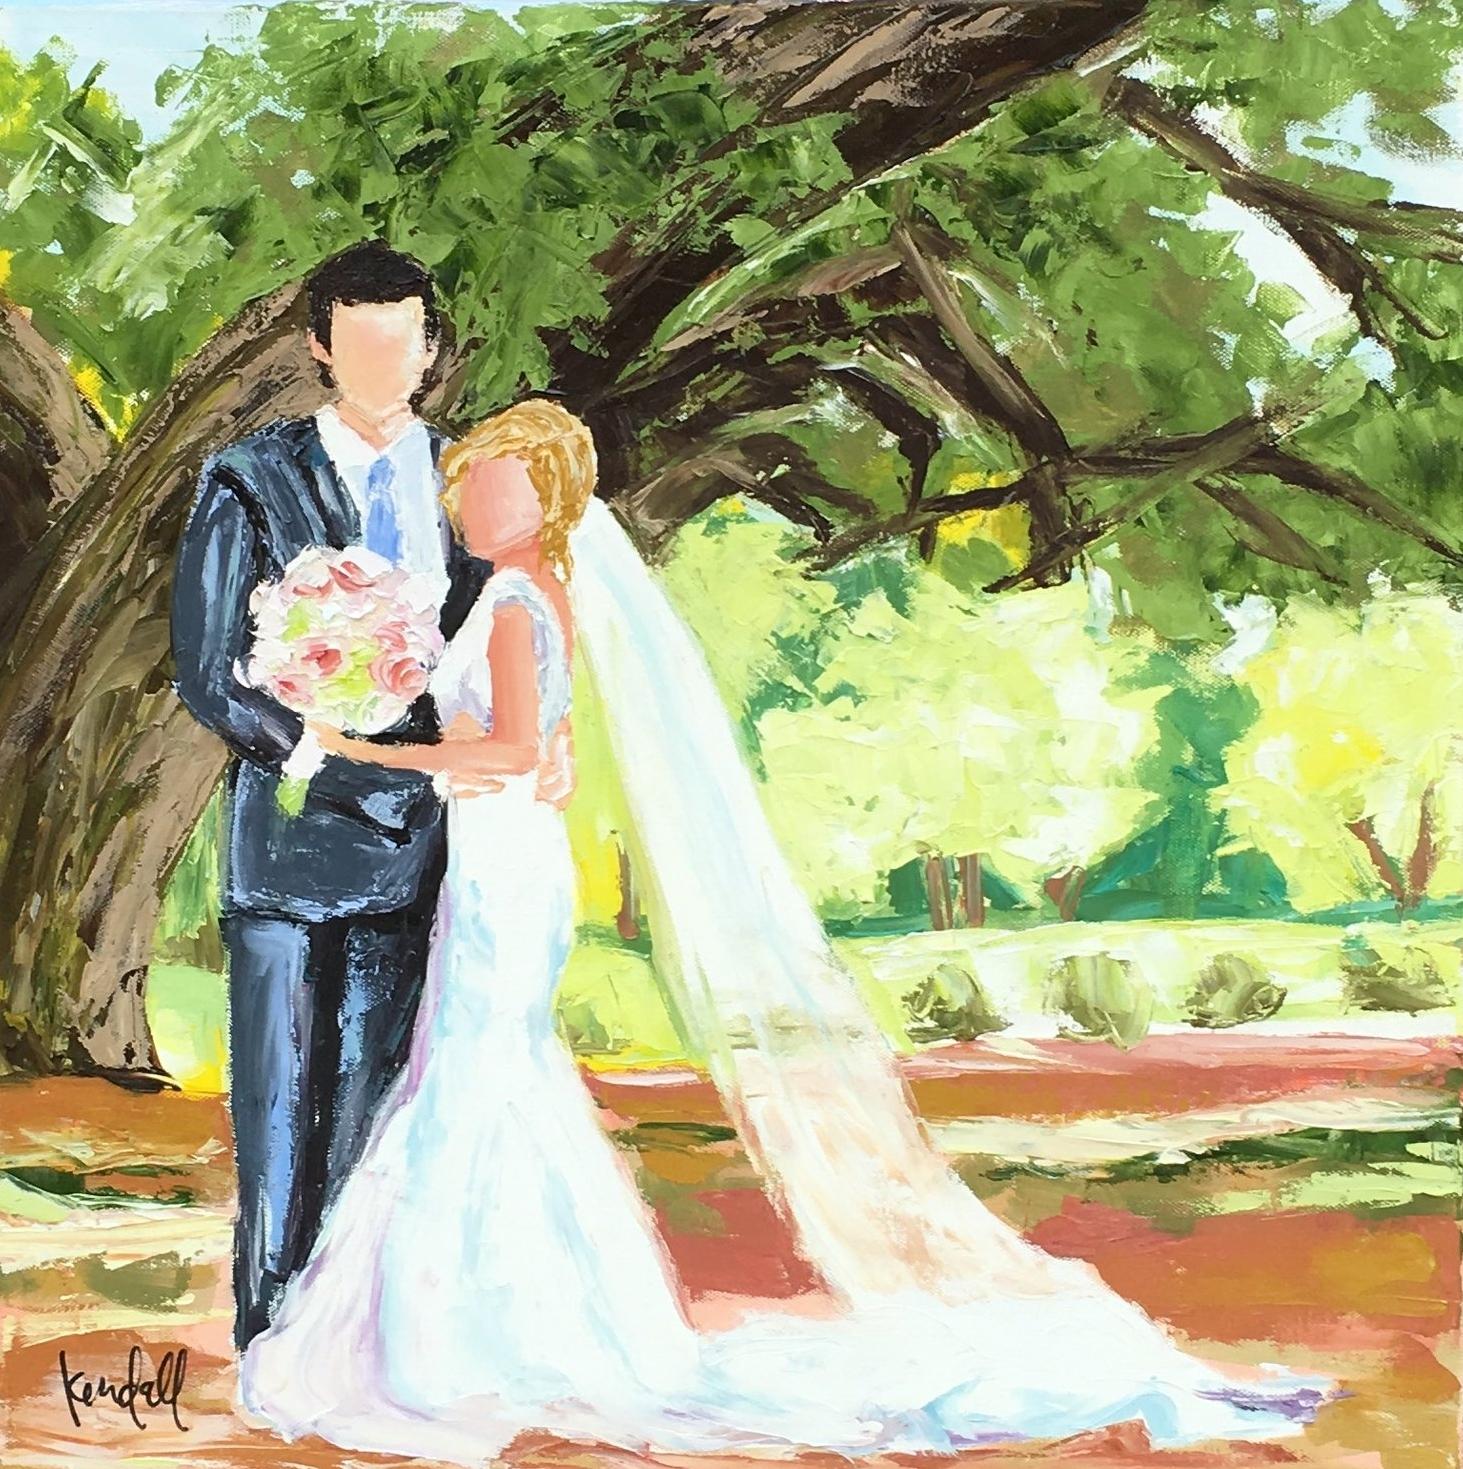 weddingexample.jpg